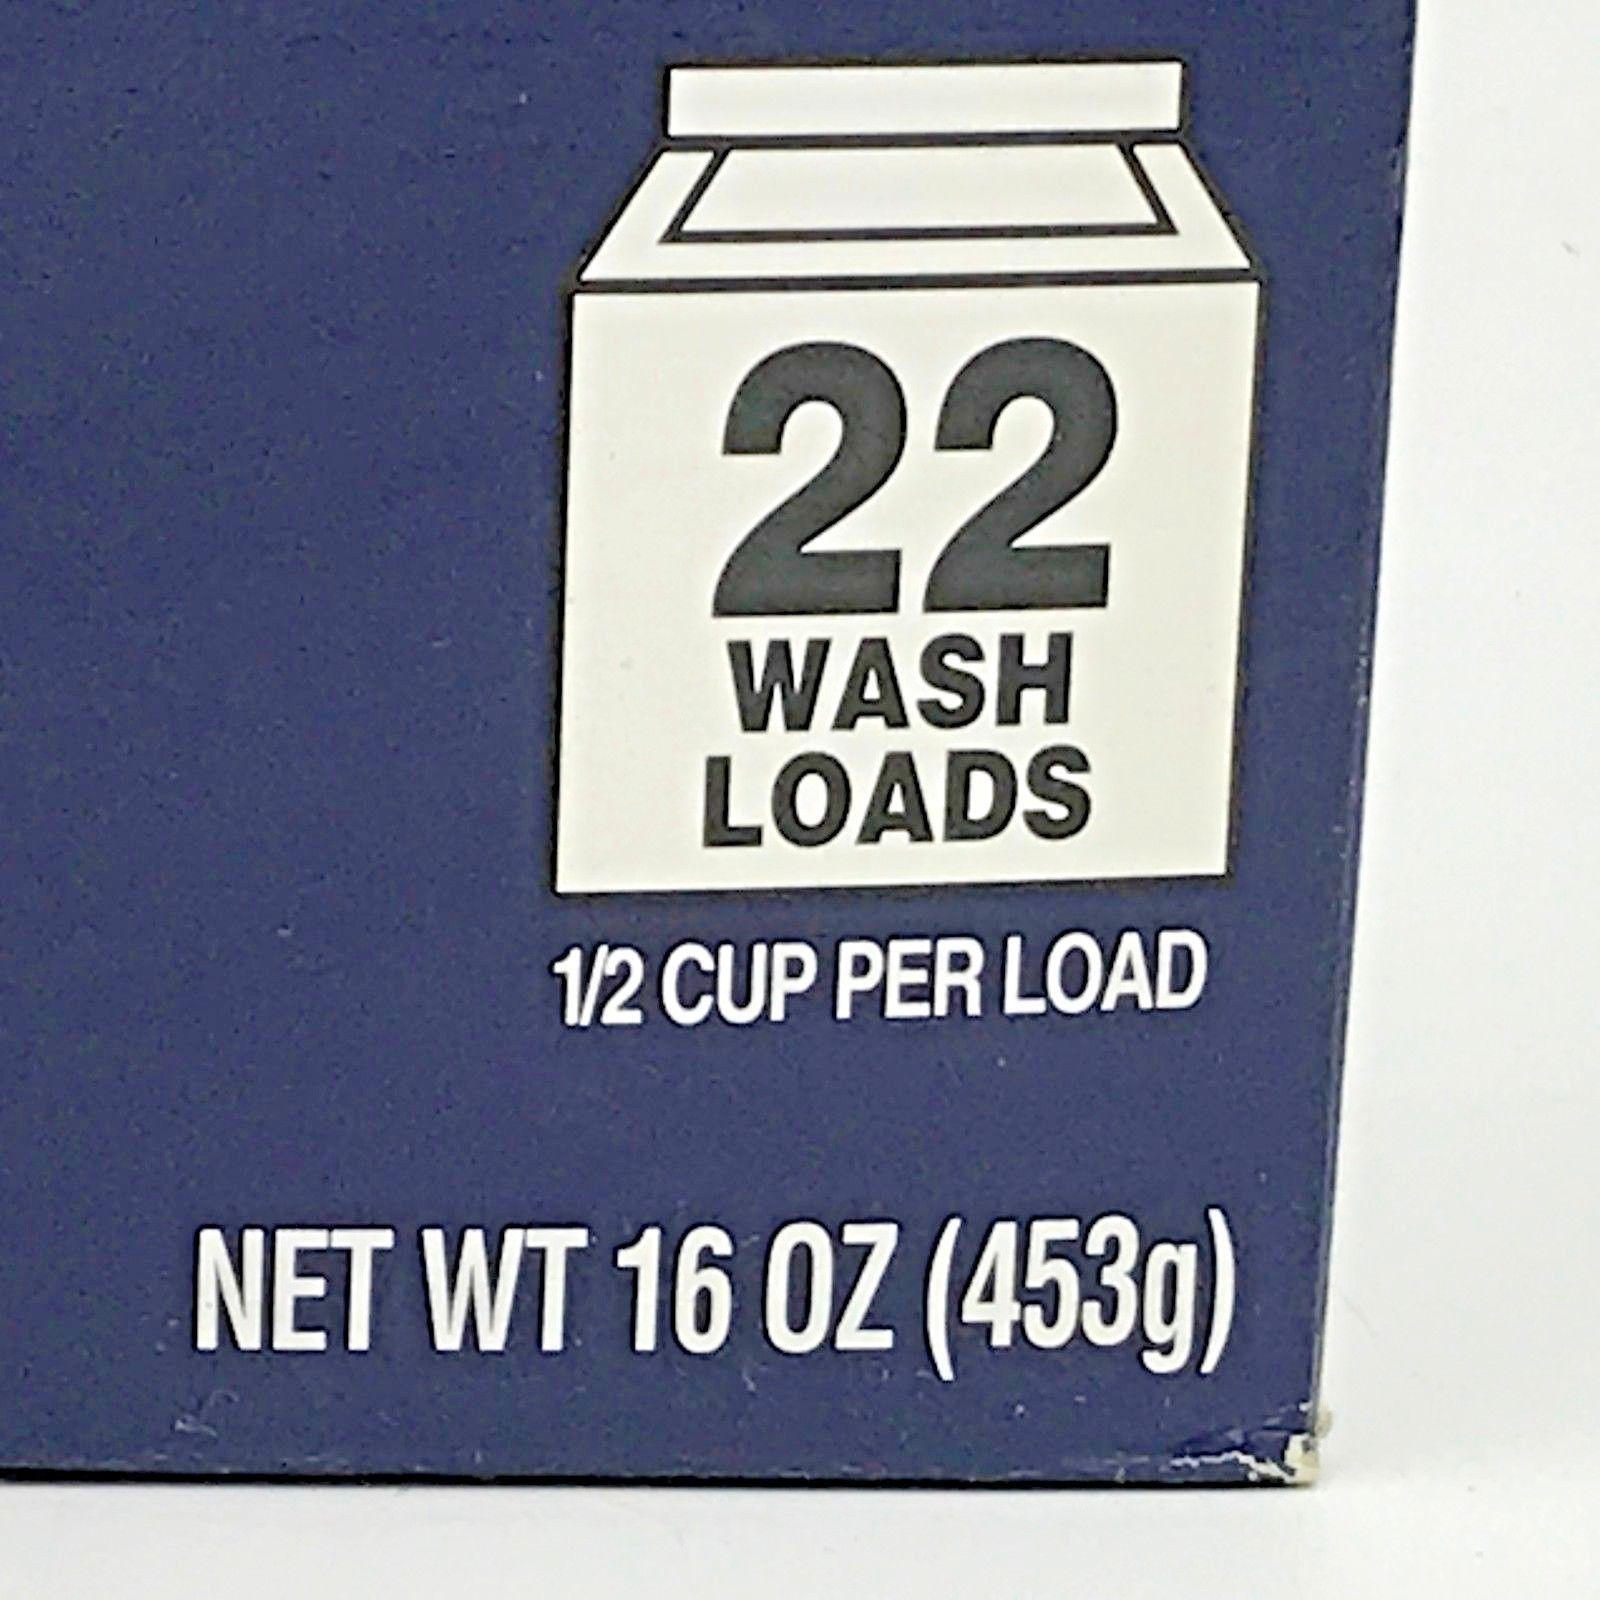 Vintage 1990s La France Laundry Whitener Lot of 3 16 oz Boxes New Dial Corp HH